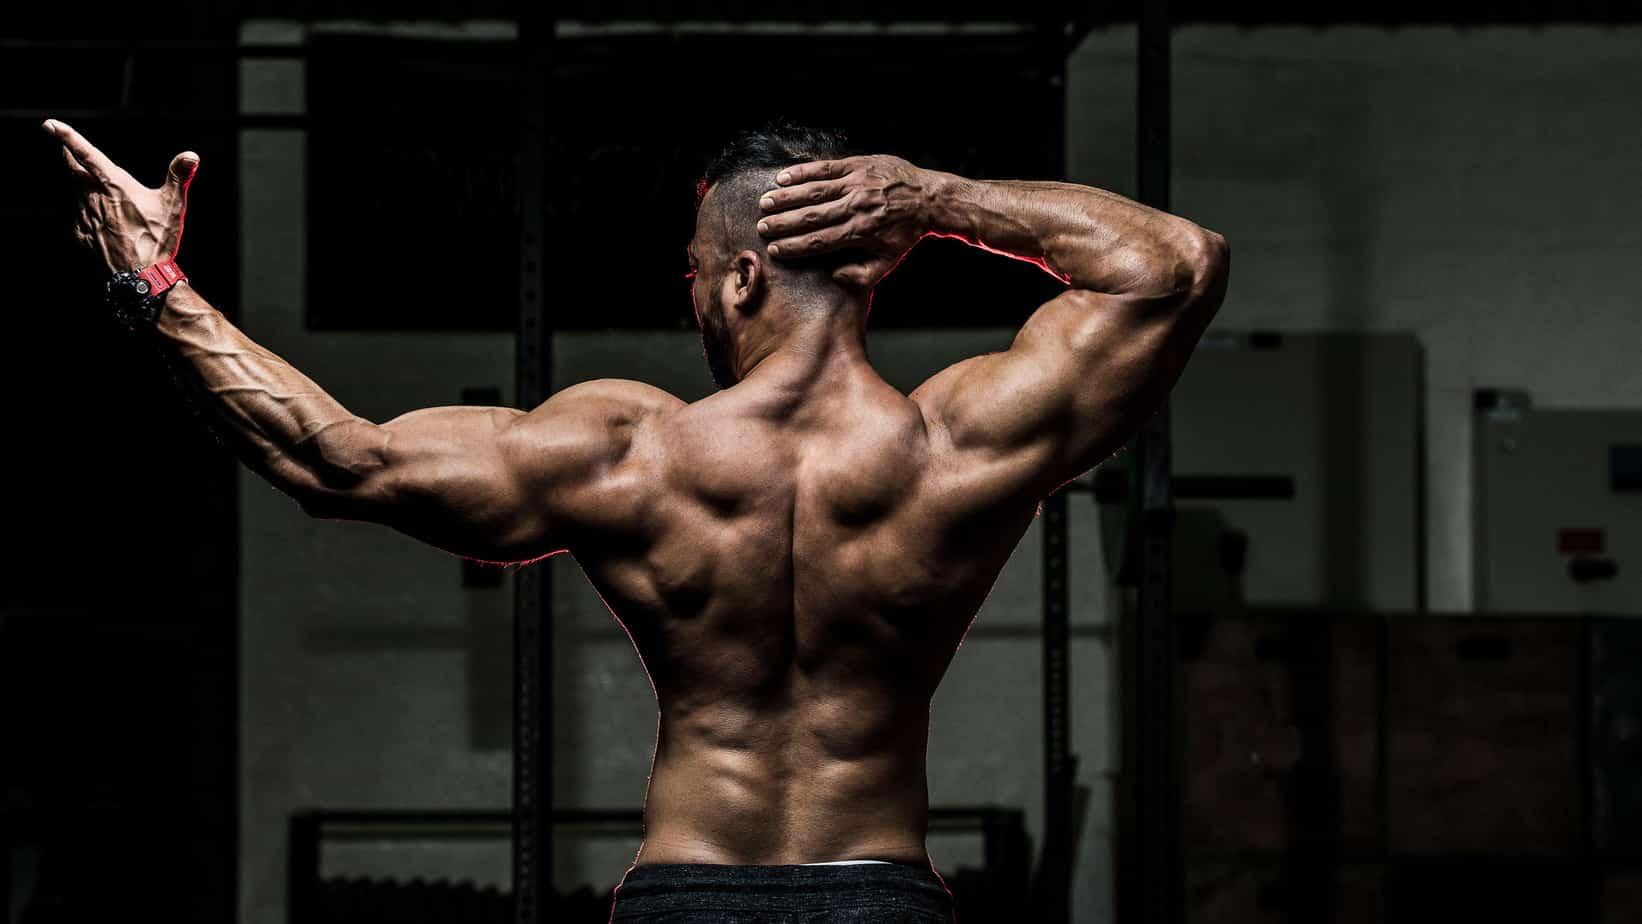 Body posture & Energy - Plank Benefits